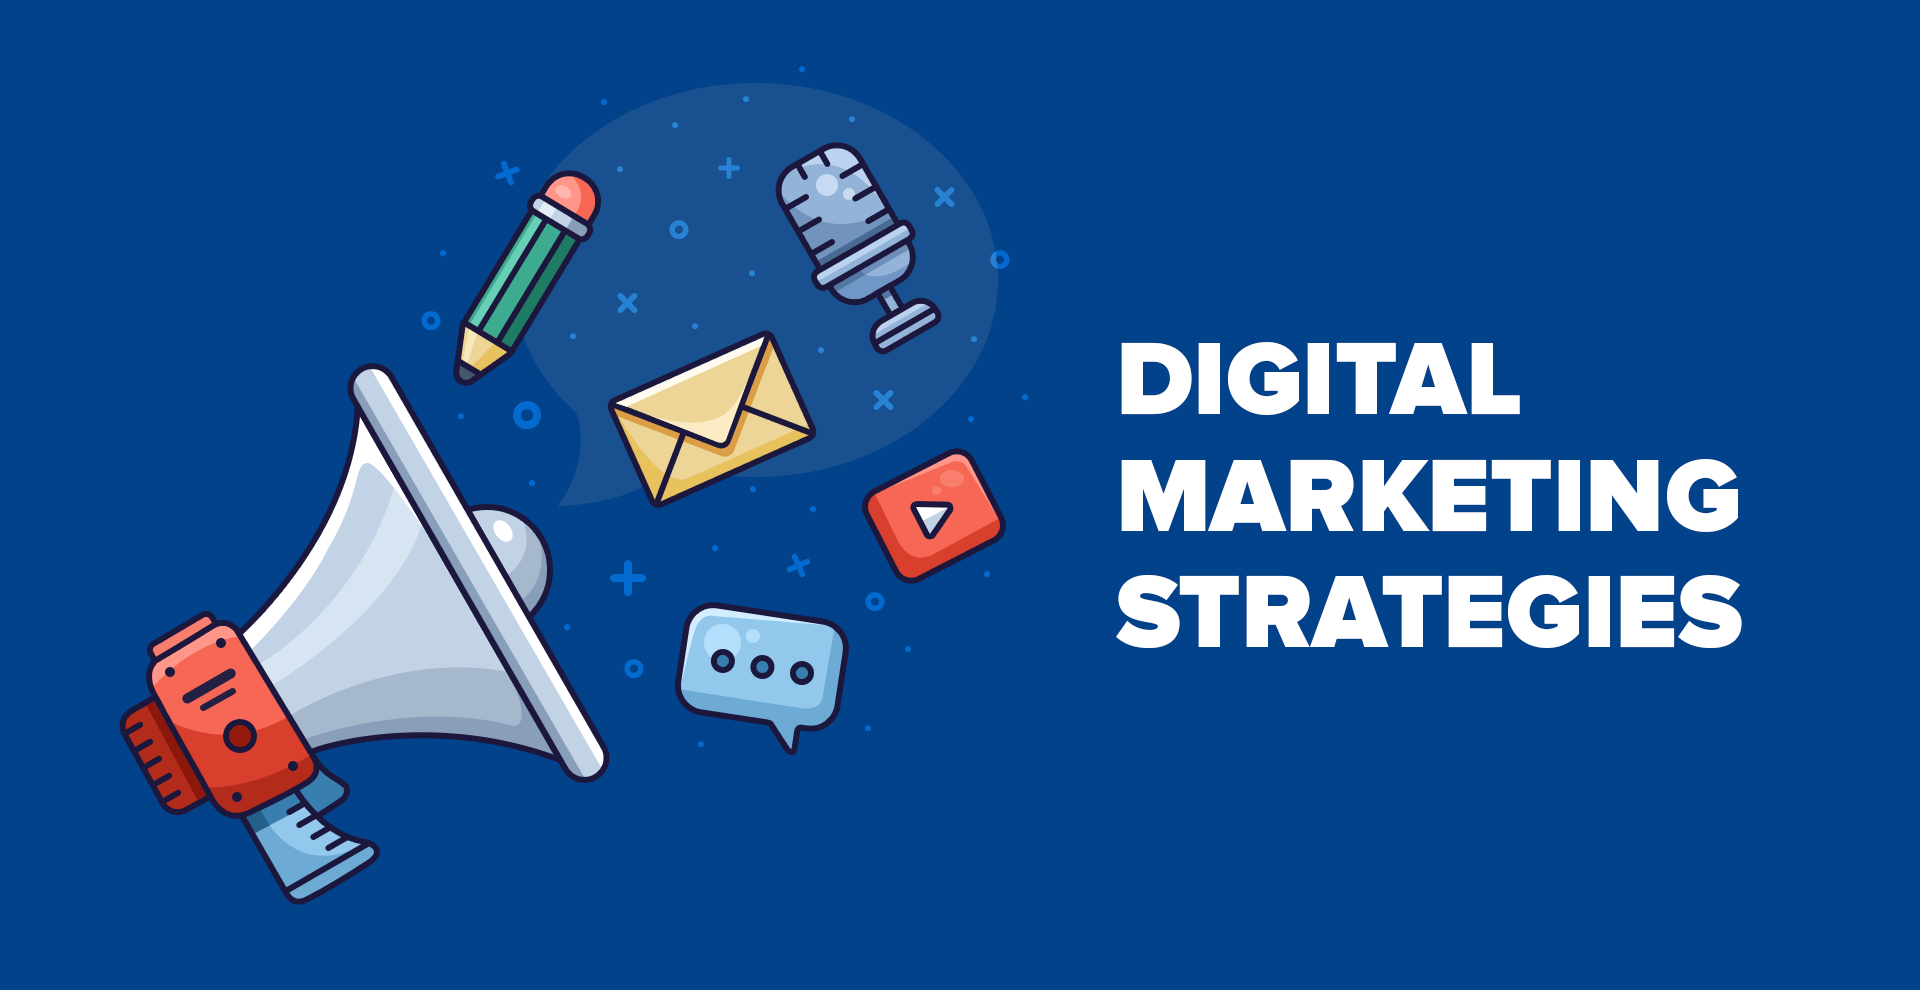 digital marketing strategies for small business in Nigeria